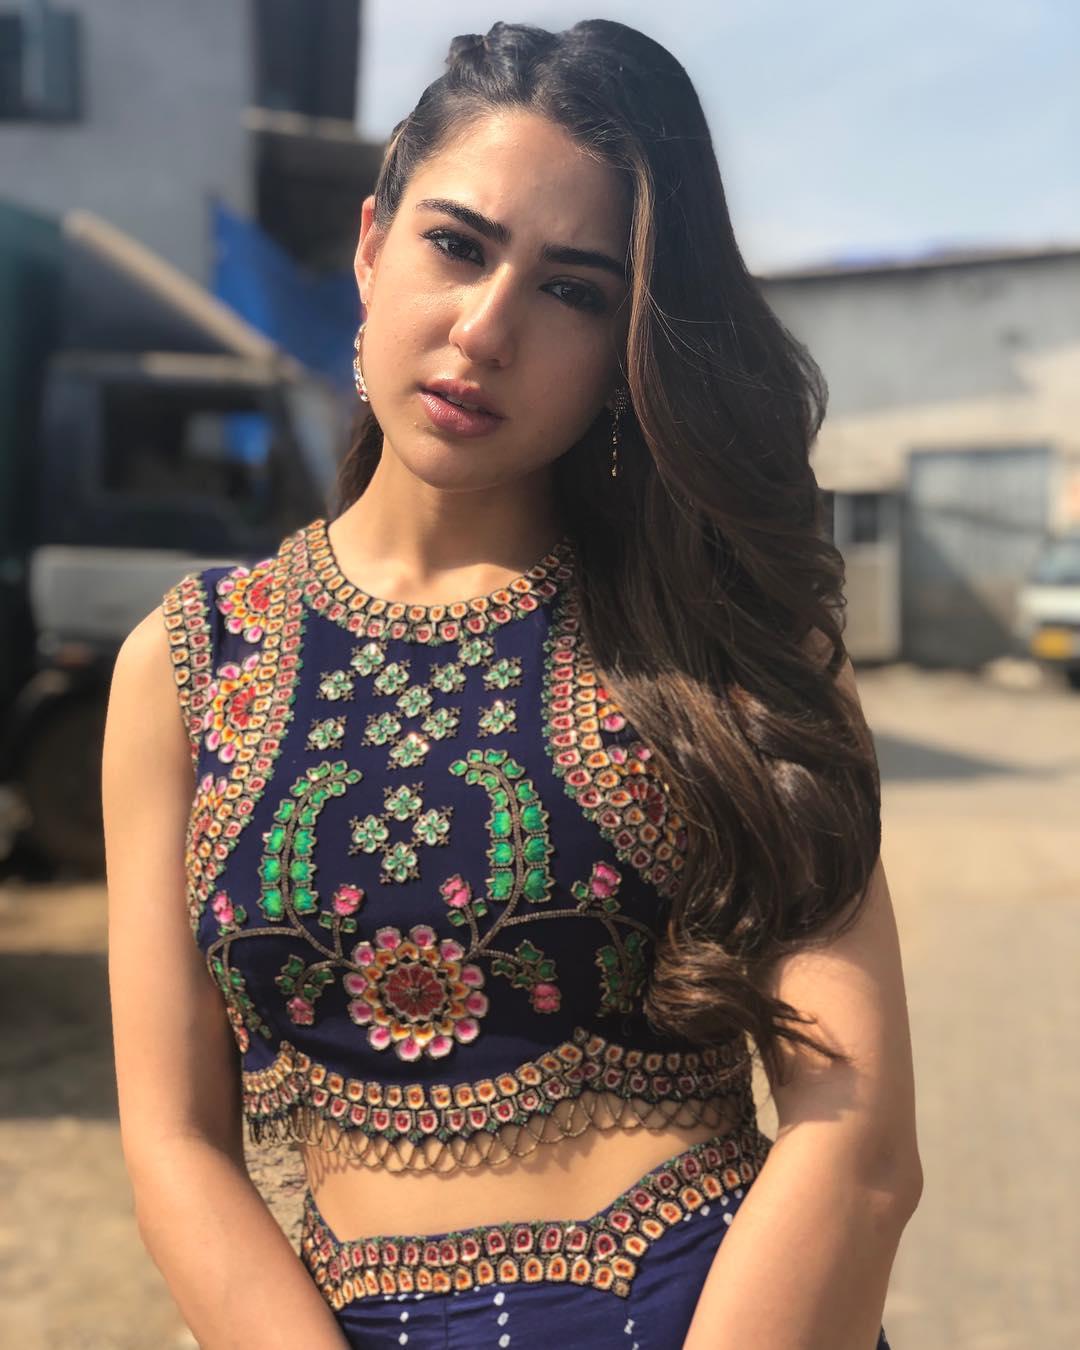 Sara Ali Khan Beautiful Pictures - HD Acress Photo